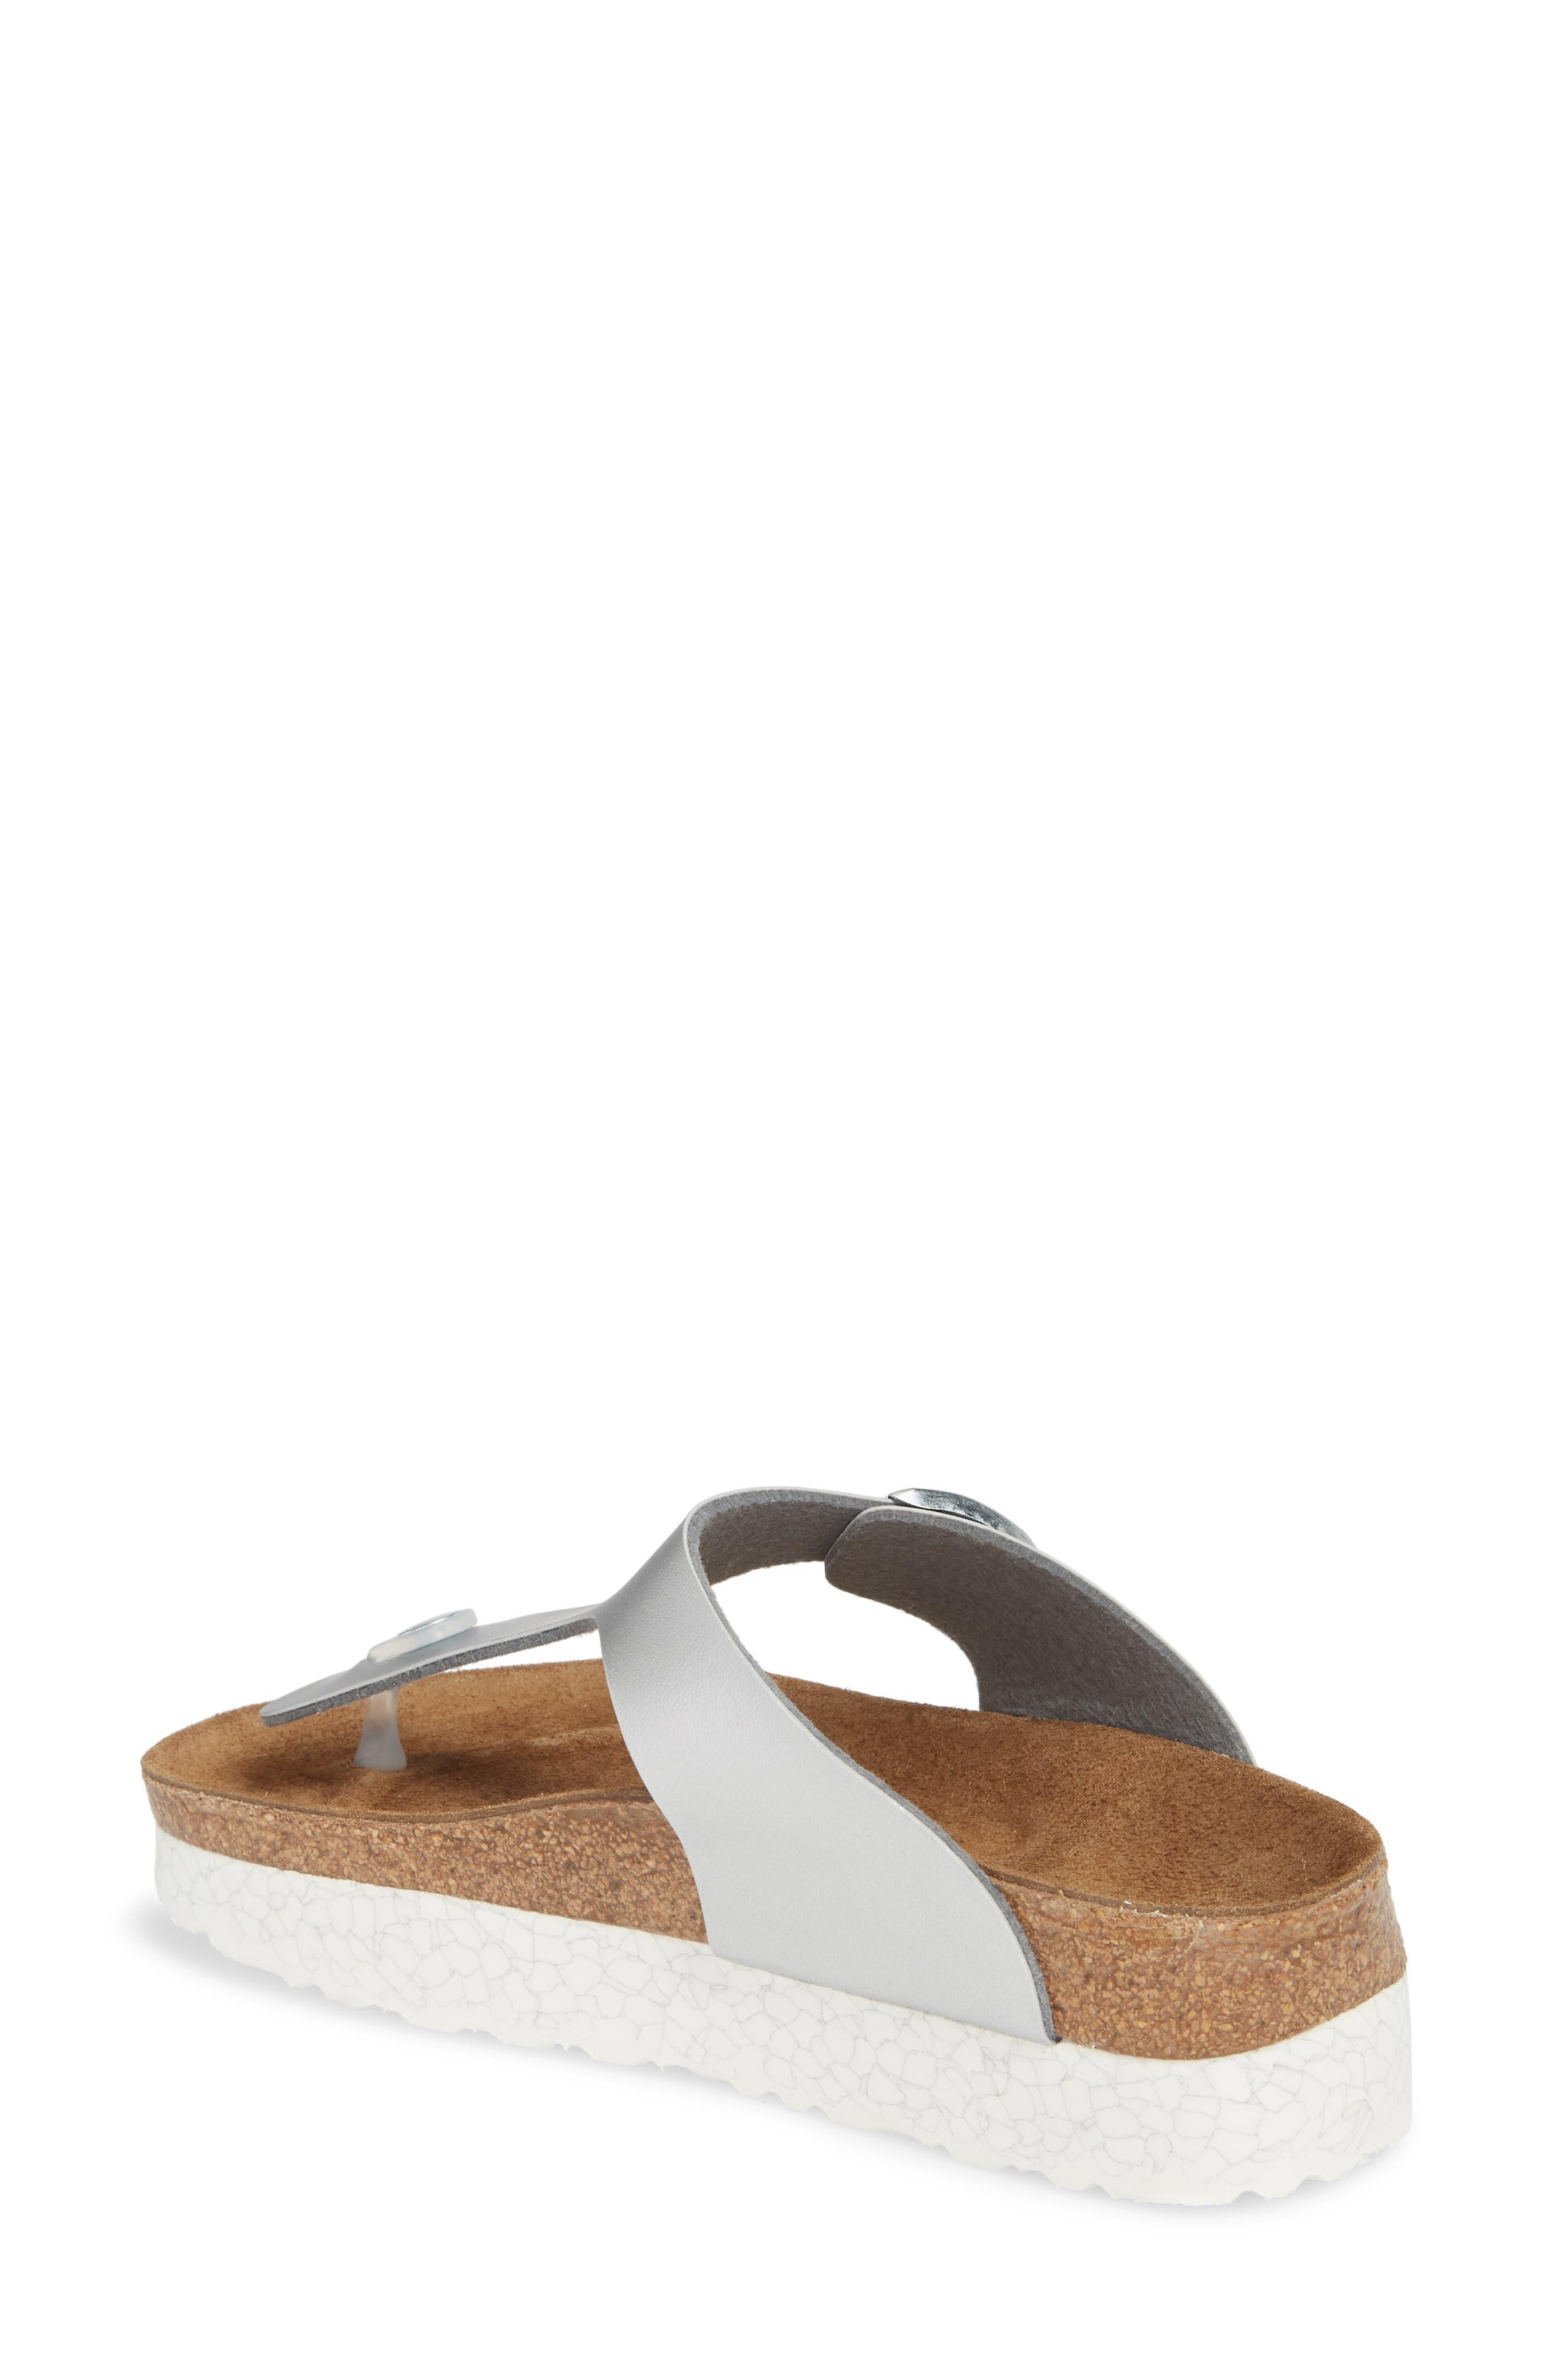 Papillio by Birkenstock 'Gizeh' Birko-Flor Platform Flip Flop Sandal,                             Alternate thumbnail 2, color,                             150